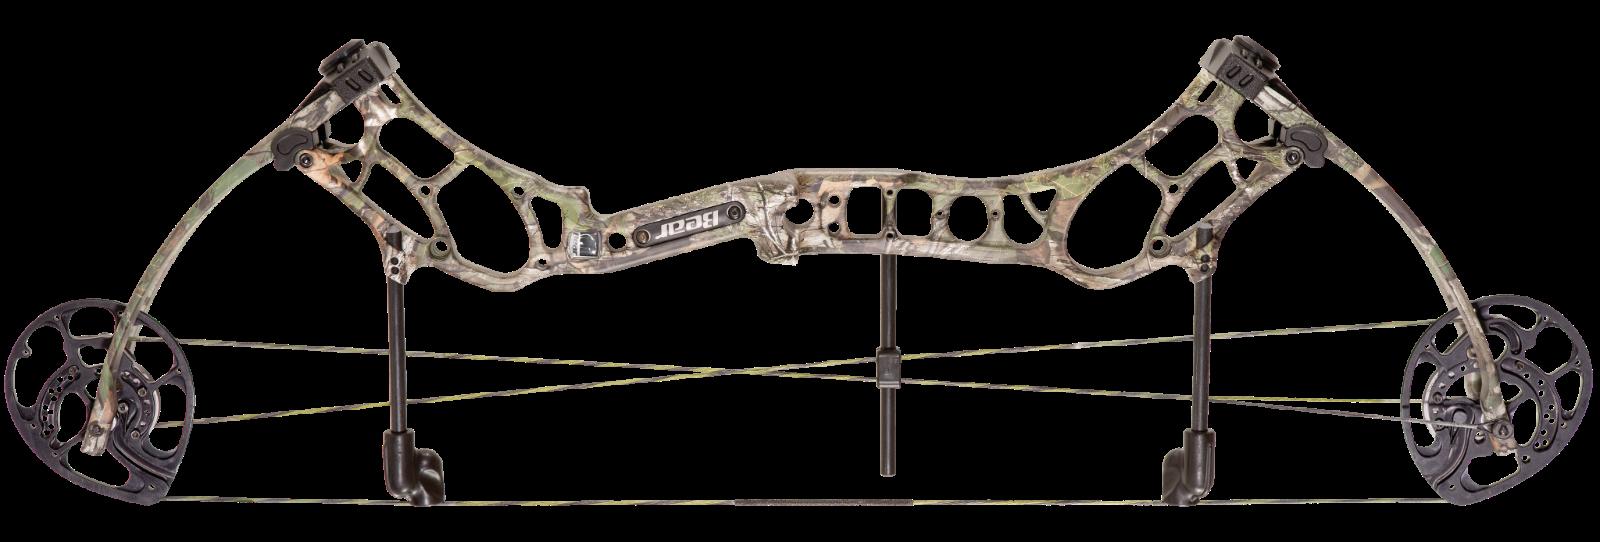 2016 Bear Archery Threat Compound Bow  - 320